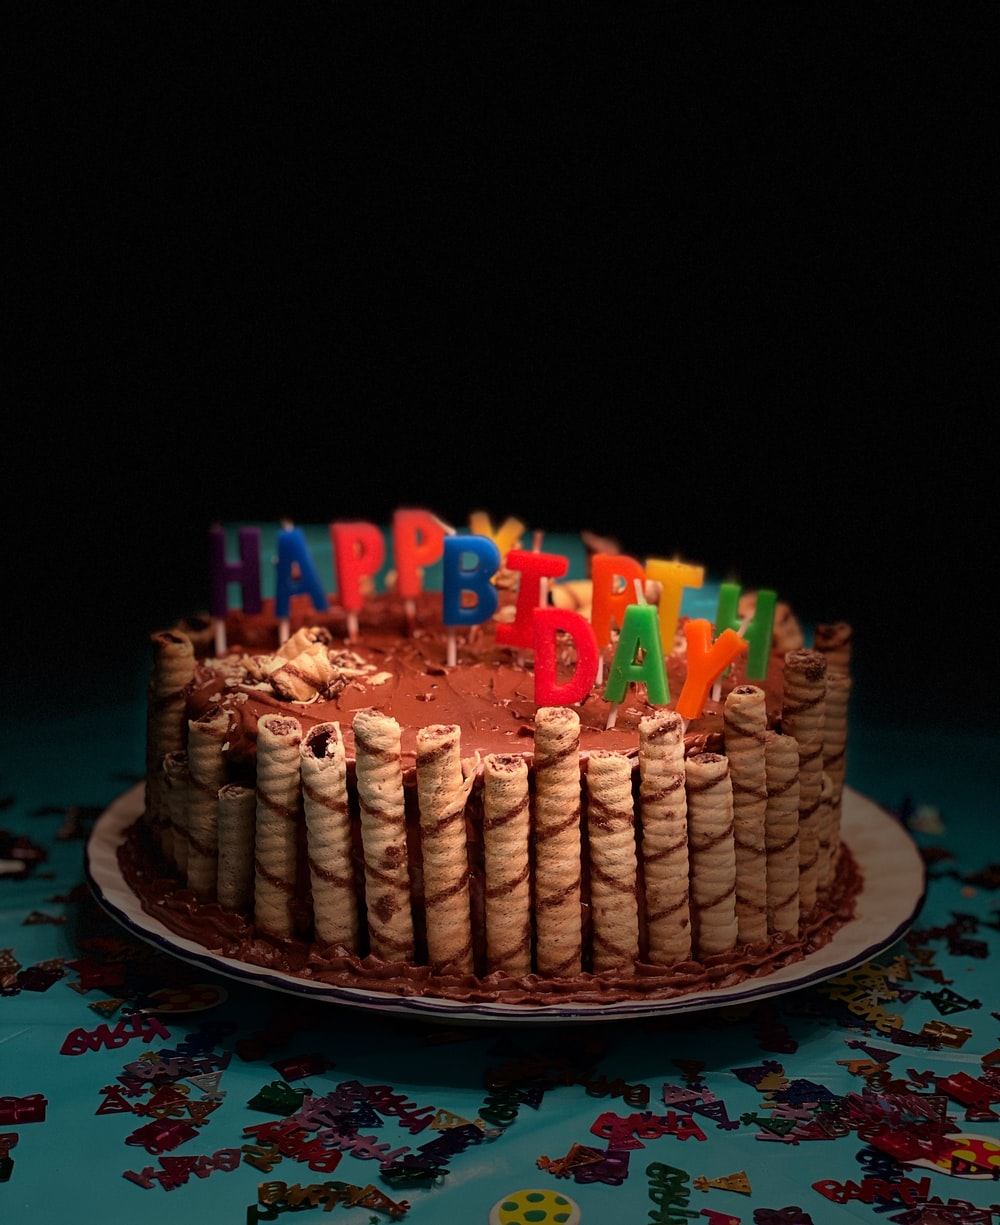 happy birthday cake with happy birthday candles